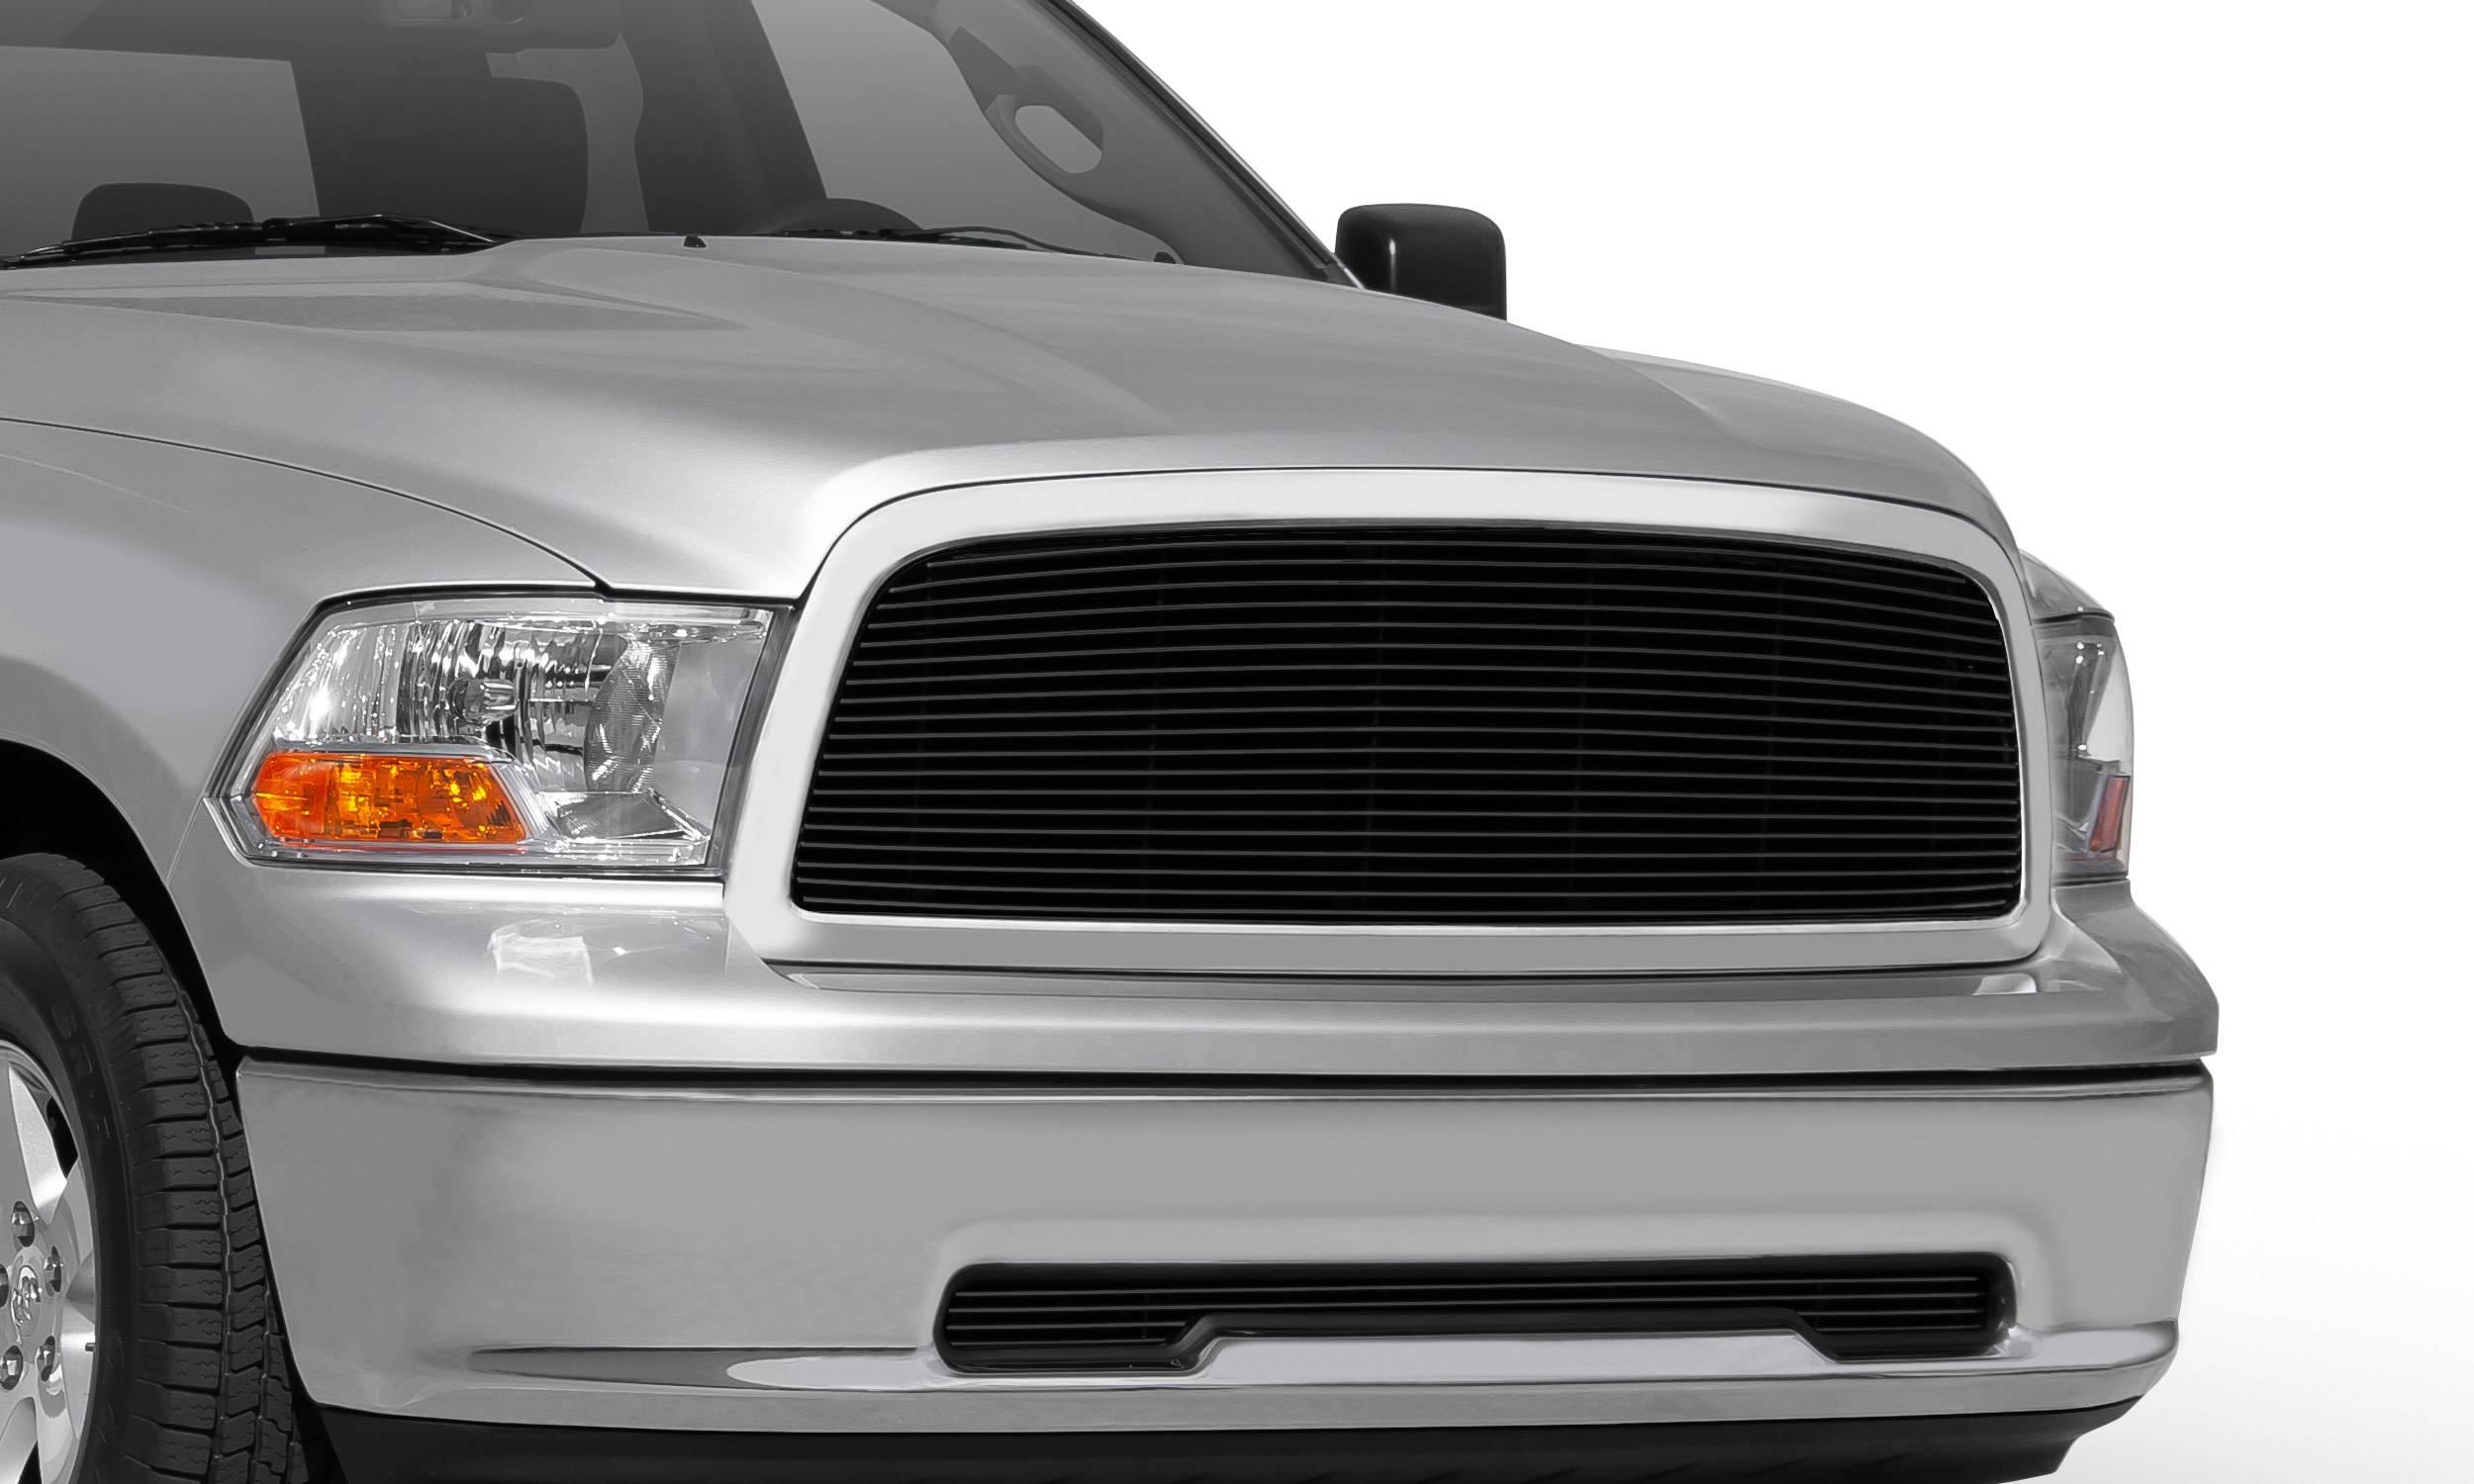 T-REX Grilles - Dodge Ram PU 1500 Billet Grille Insert - Black - 1 Pc - Pt # 20457B